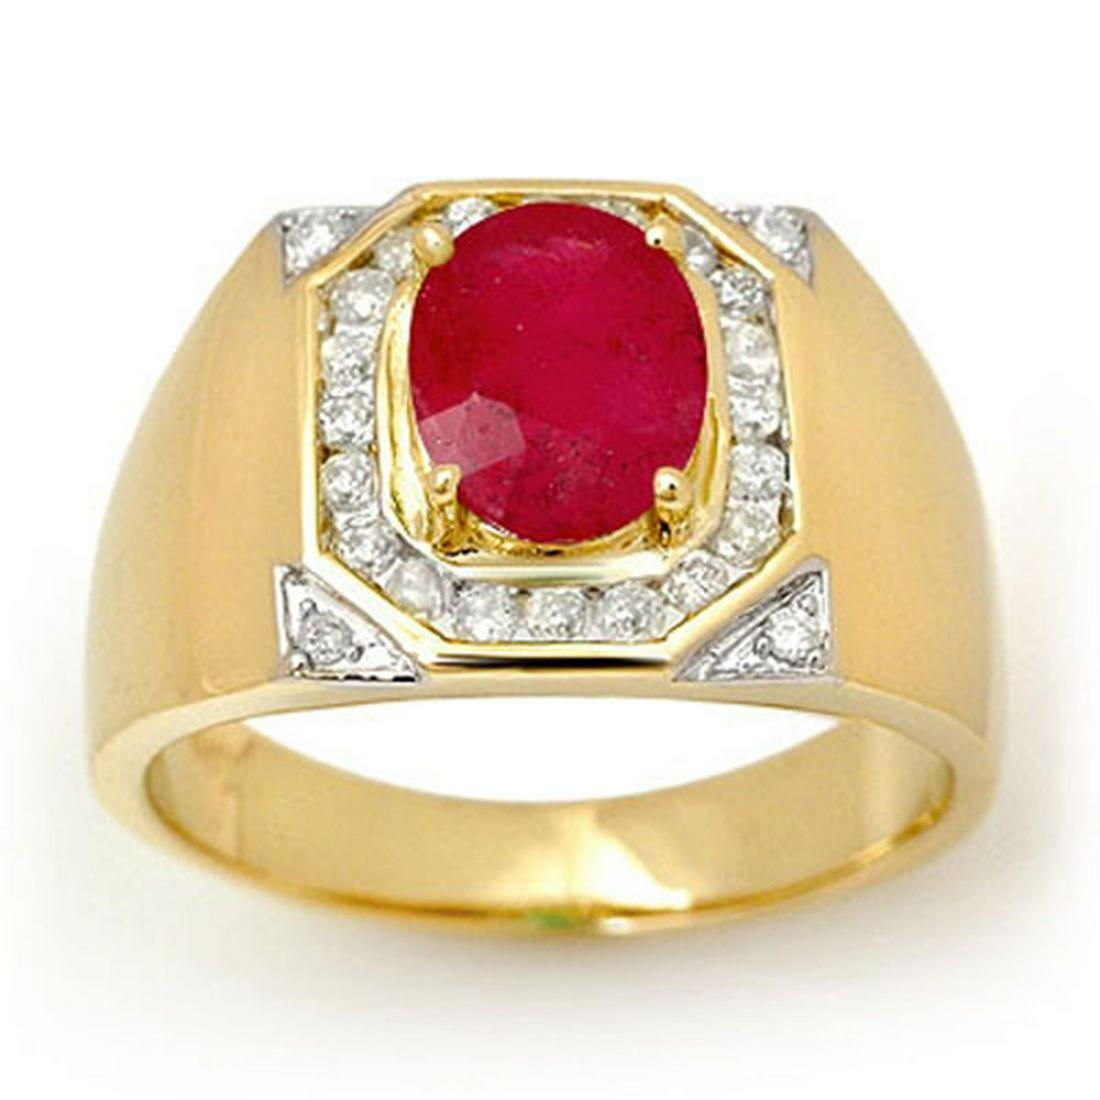 3.60 ctw Ruby & Diamond Men's Ring 14K Yellow Gold